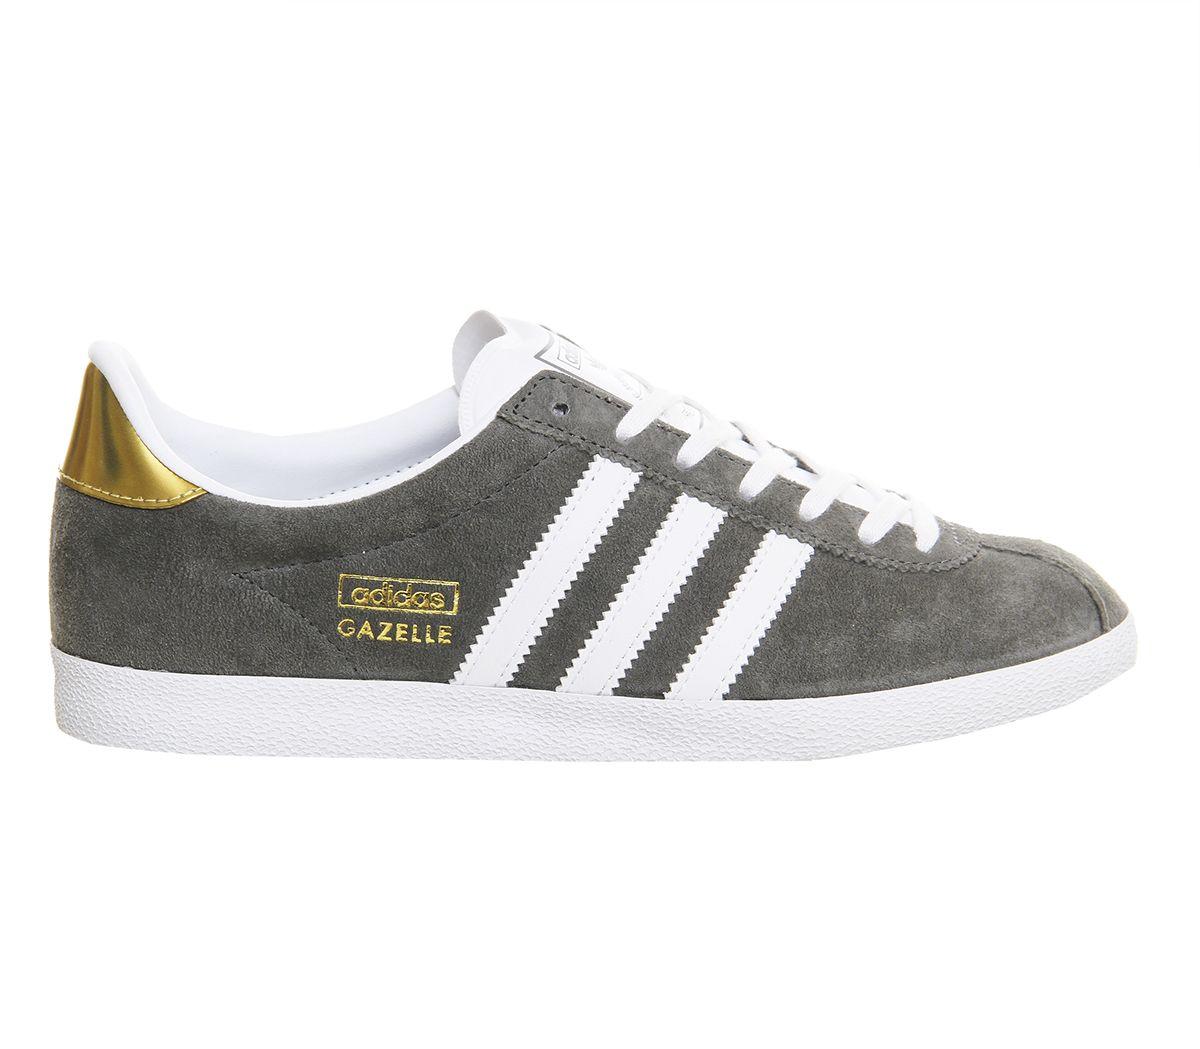 Adidas Metallic Ash Gazelle Trainers Gold Og Hers White 6ygb7f